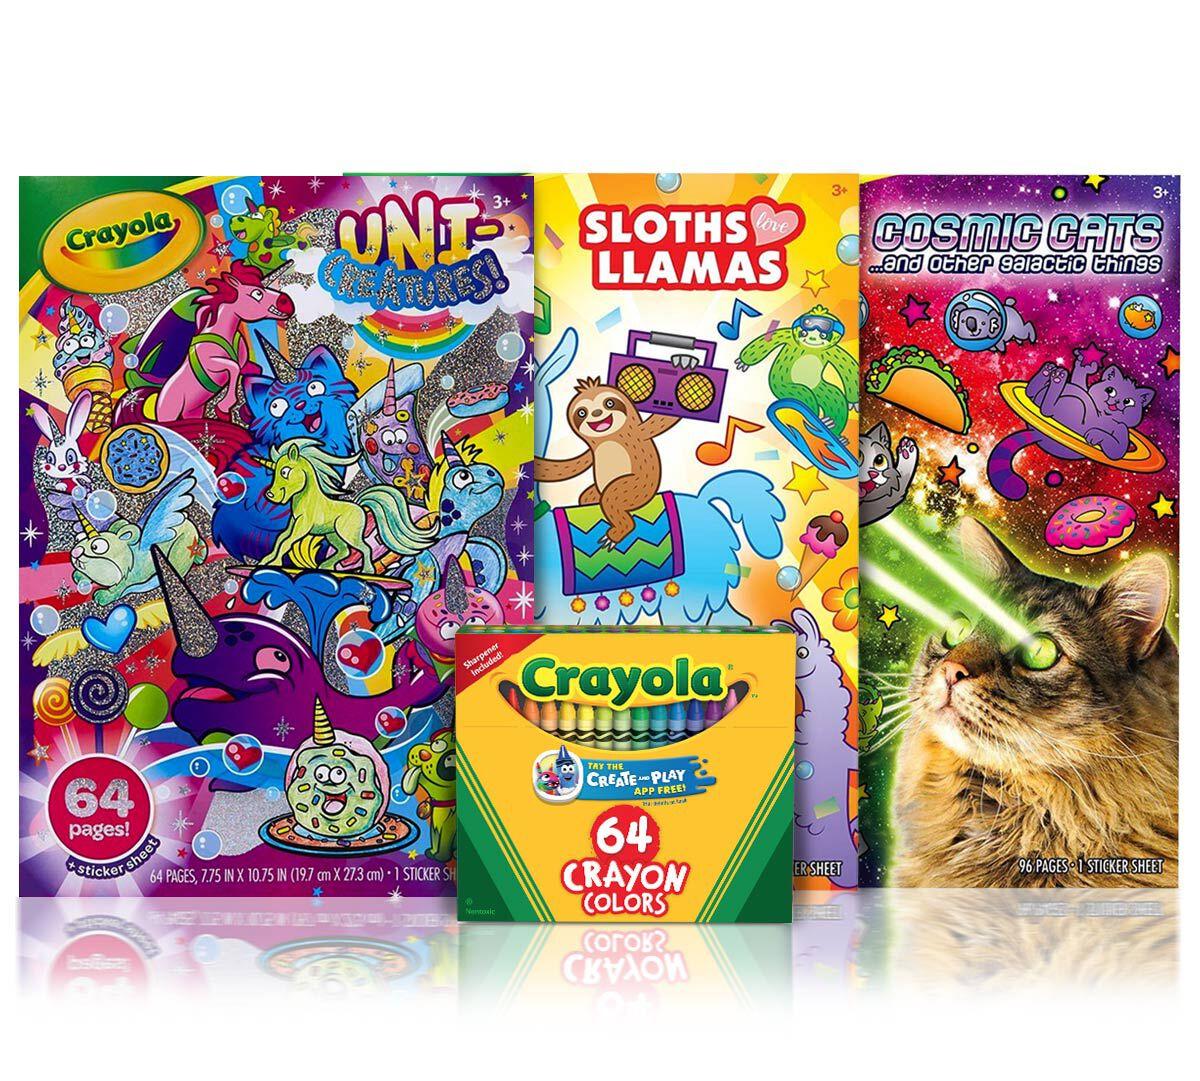 - 3 Animal Coloring Books With 64 Crayon Box Crayola.com Crayola